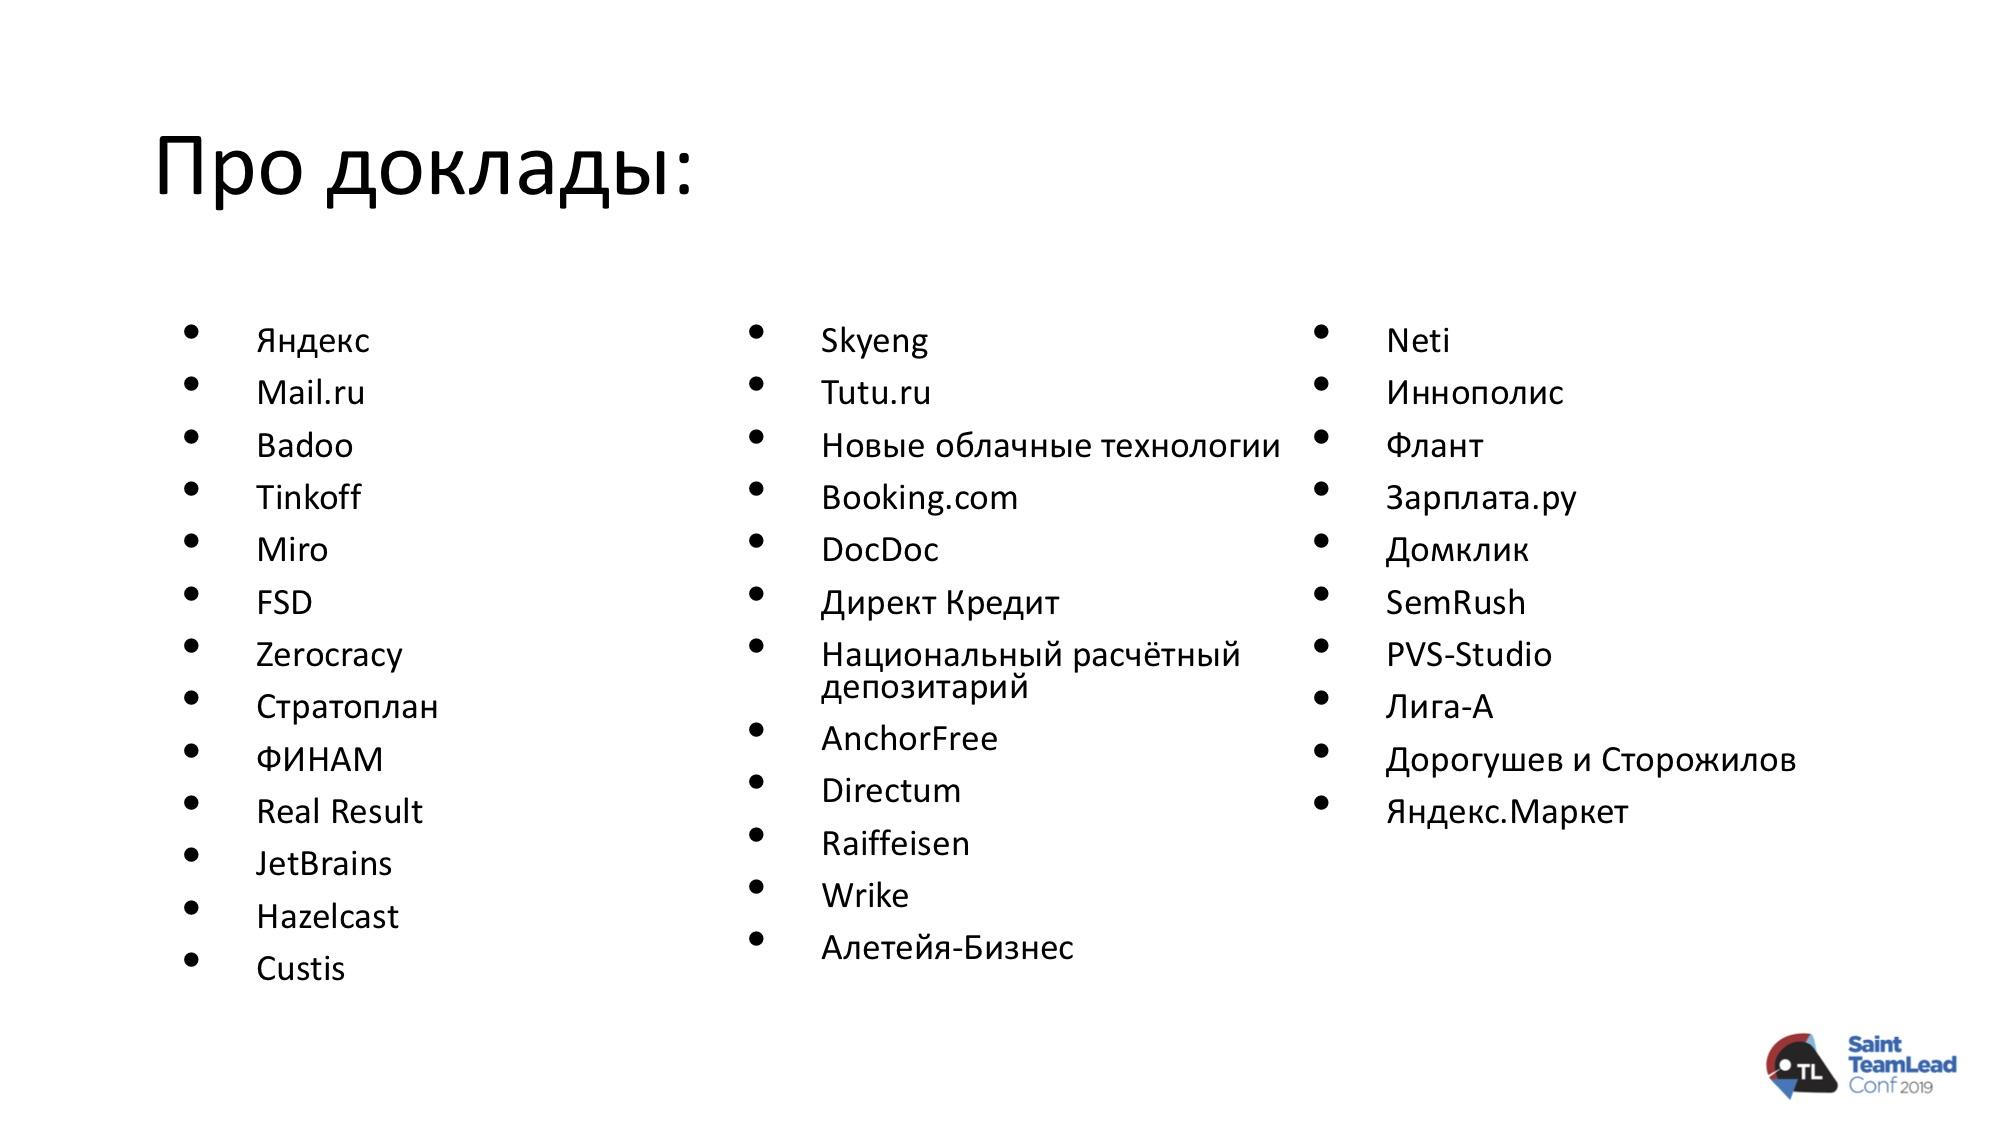 Список компаний докладчиков